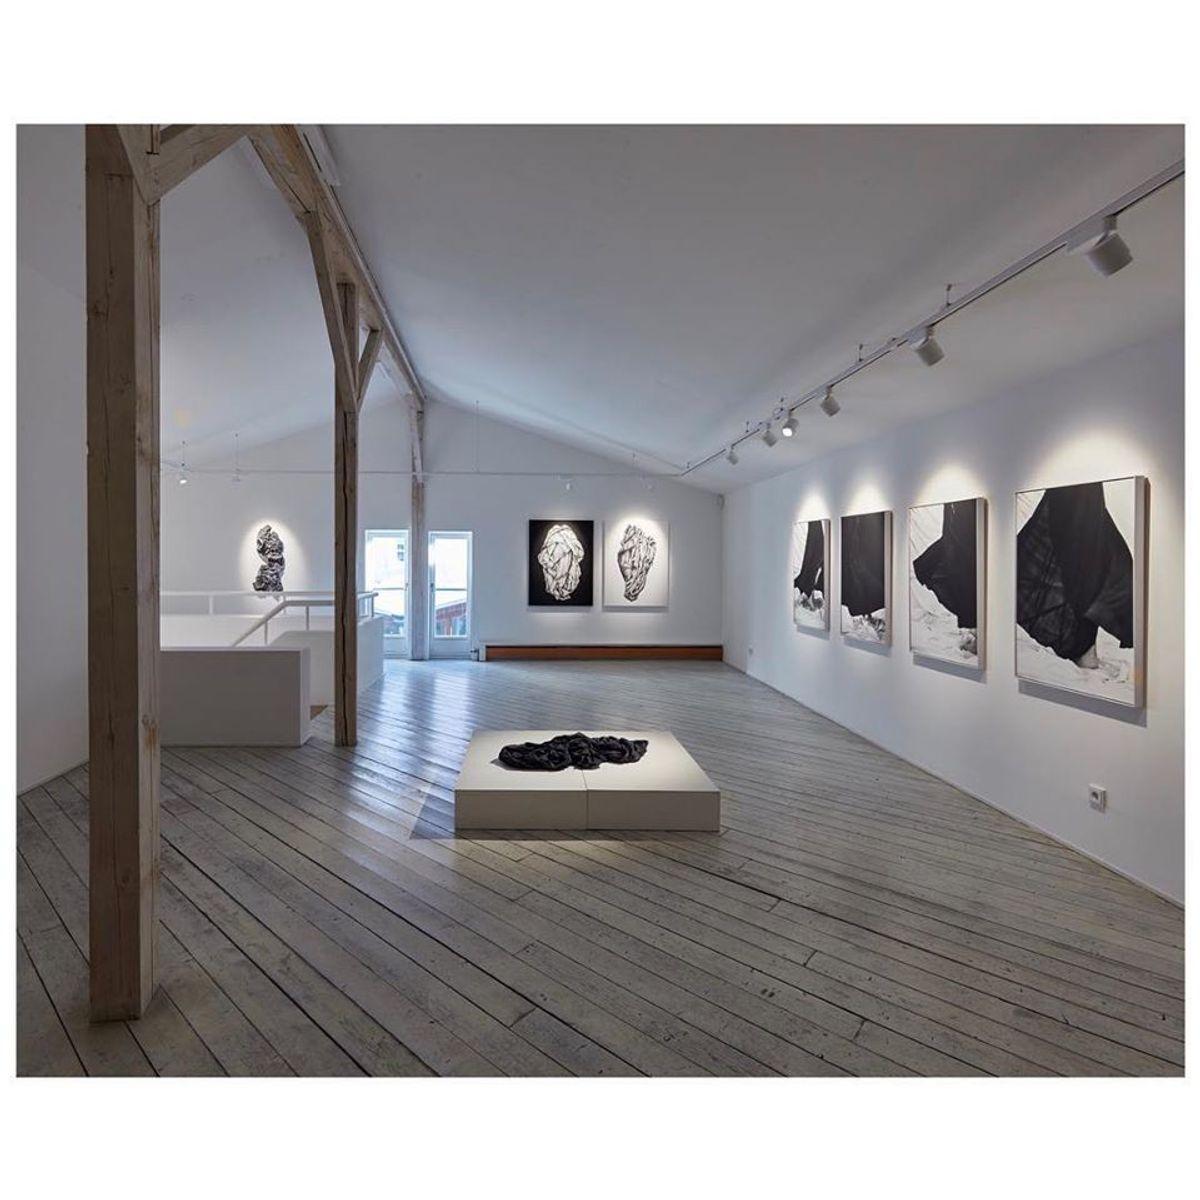 Galerie Weihergut